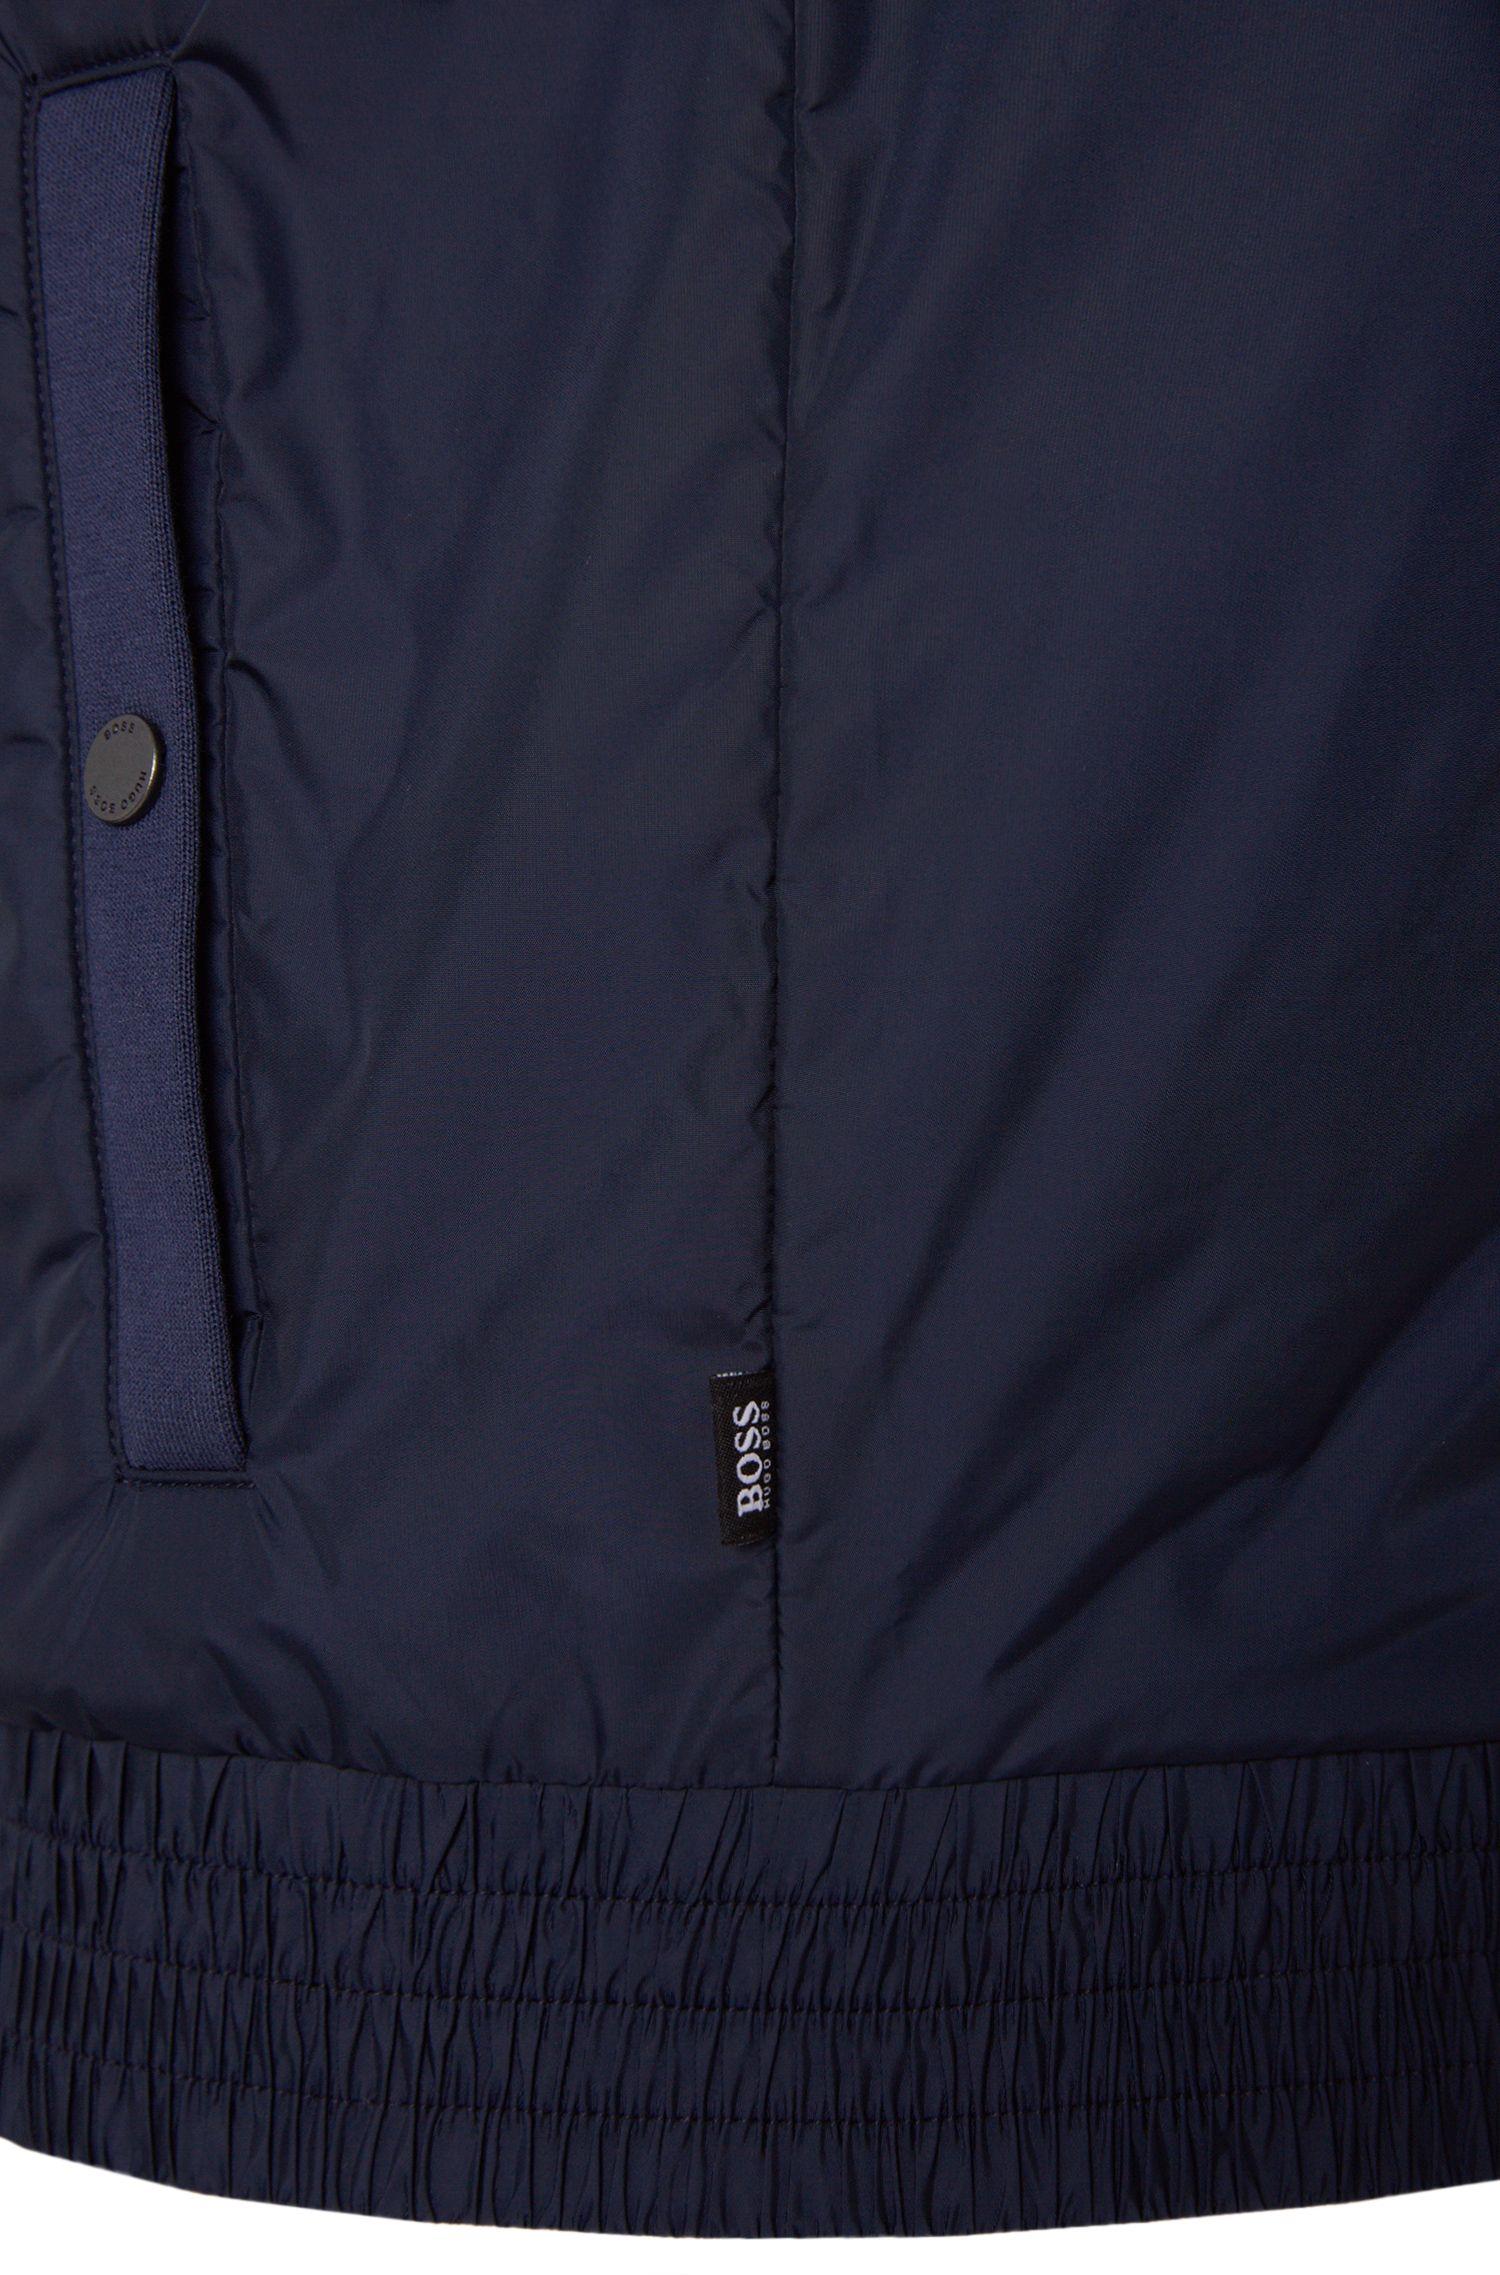 Regular-Fit Jacke aus Baumwoll-Mix: 'Shepherd 03'